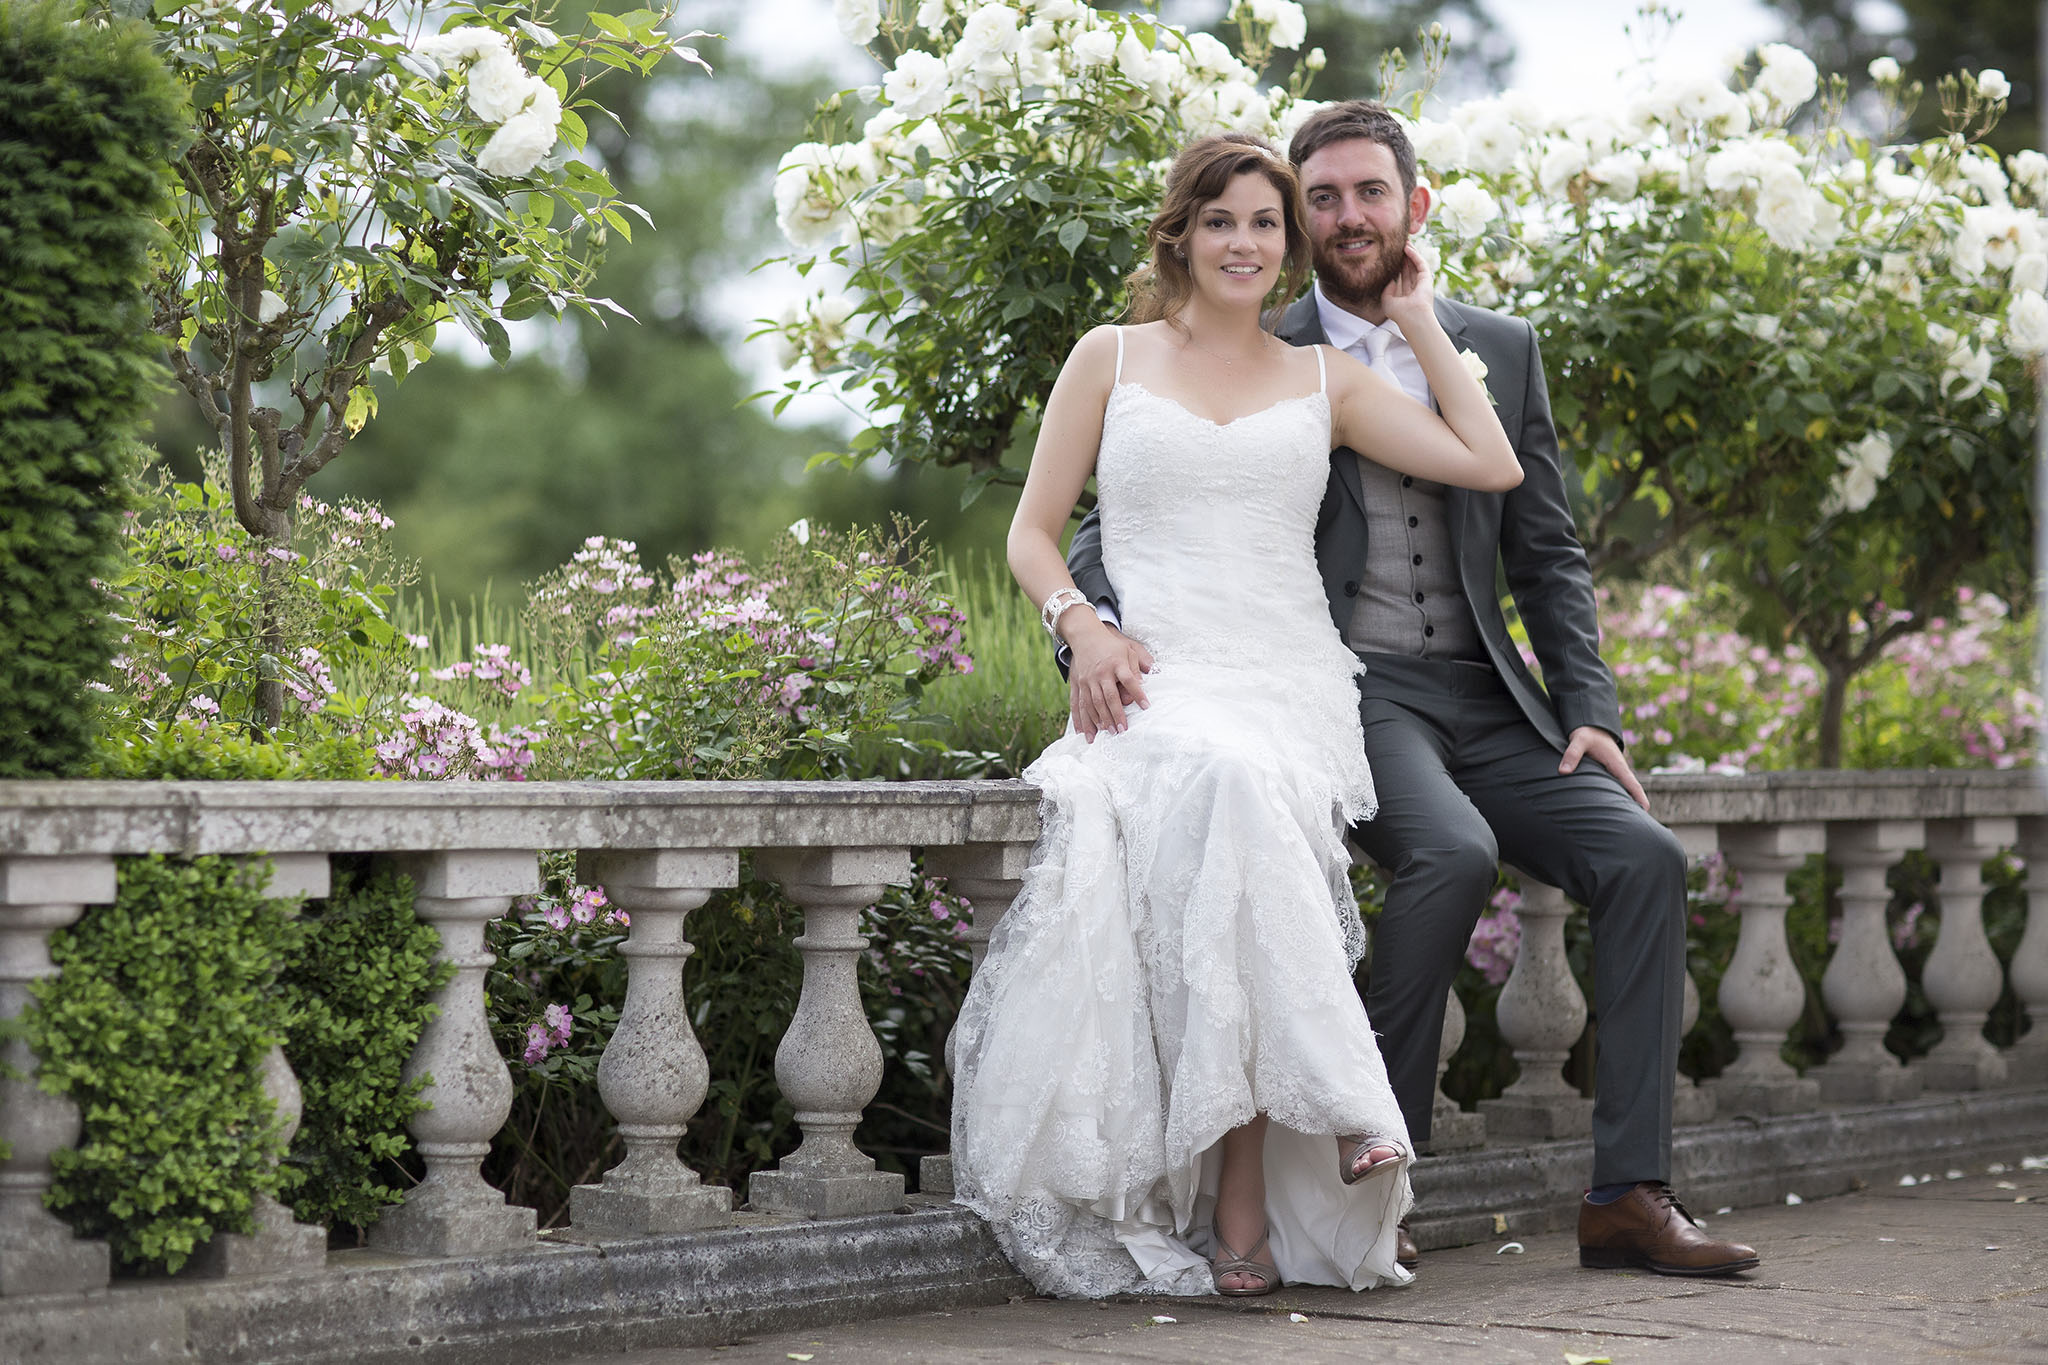 elizabethgphotography_kingslangley_hertfordshire_fineart_wedding_enfield_ricky_nicole_nahlis_51.jpg